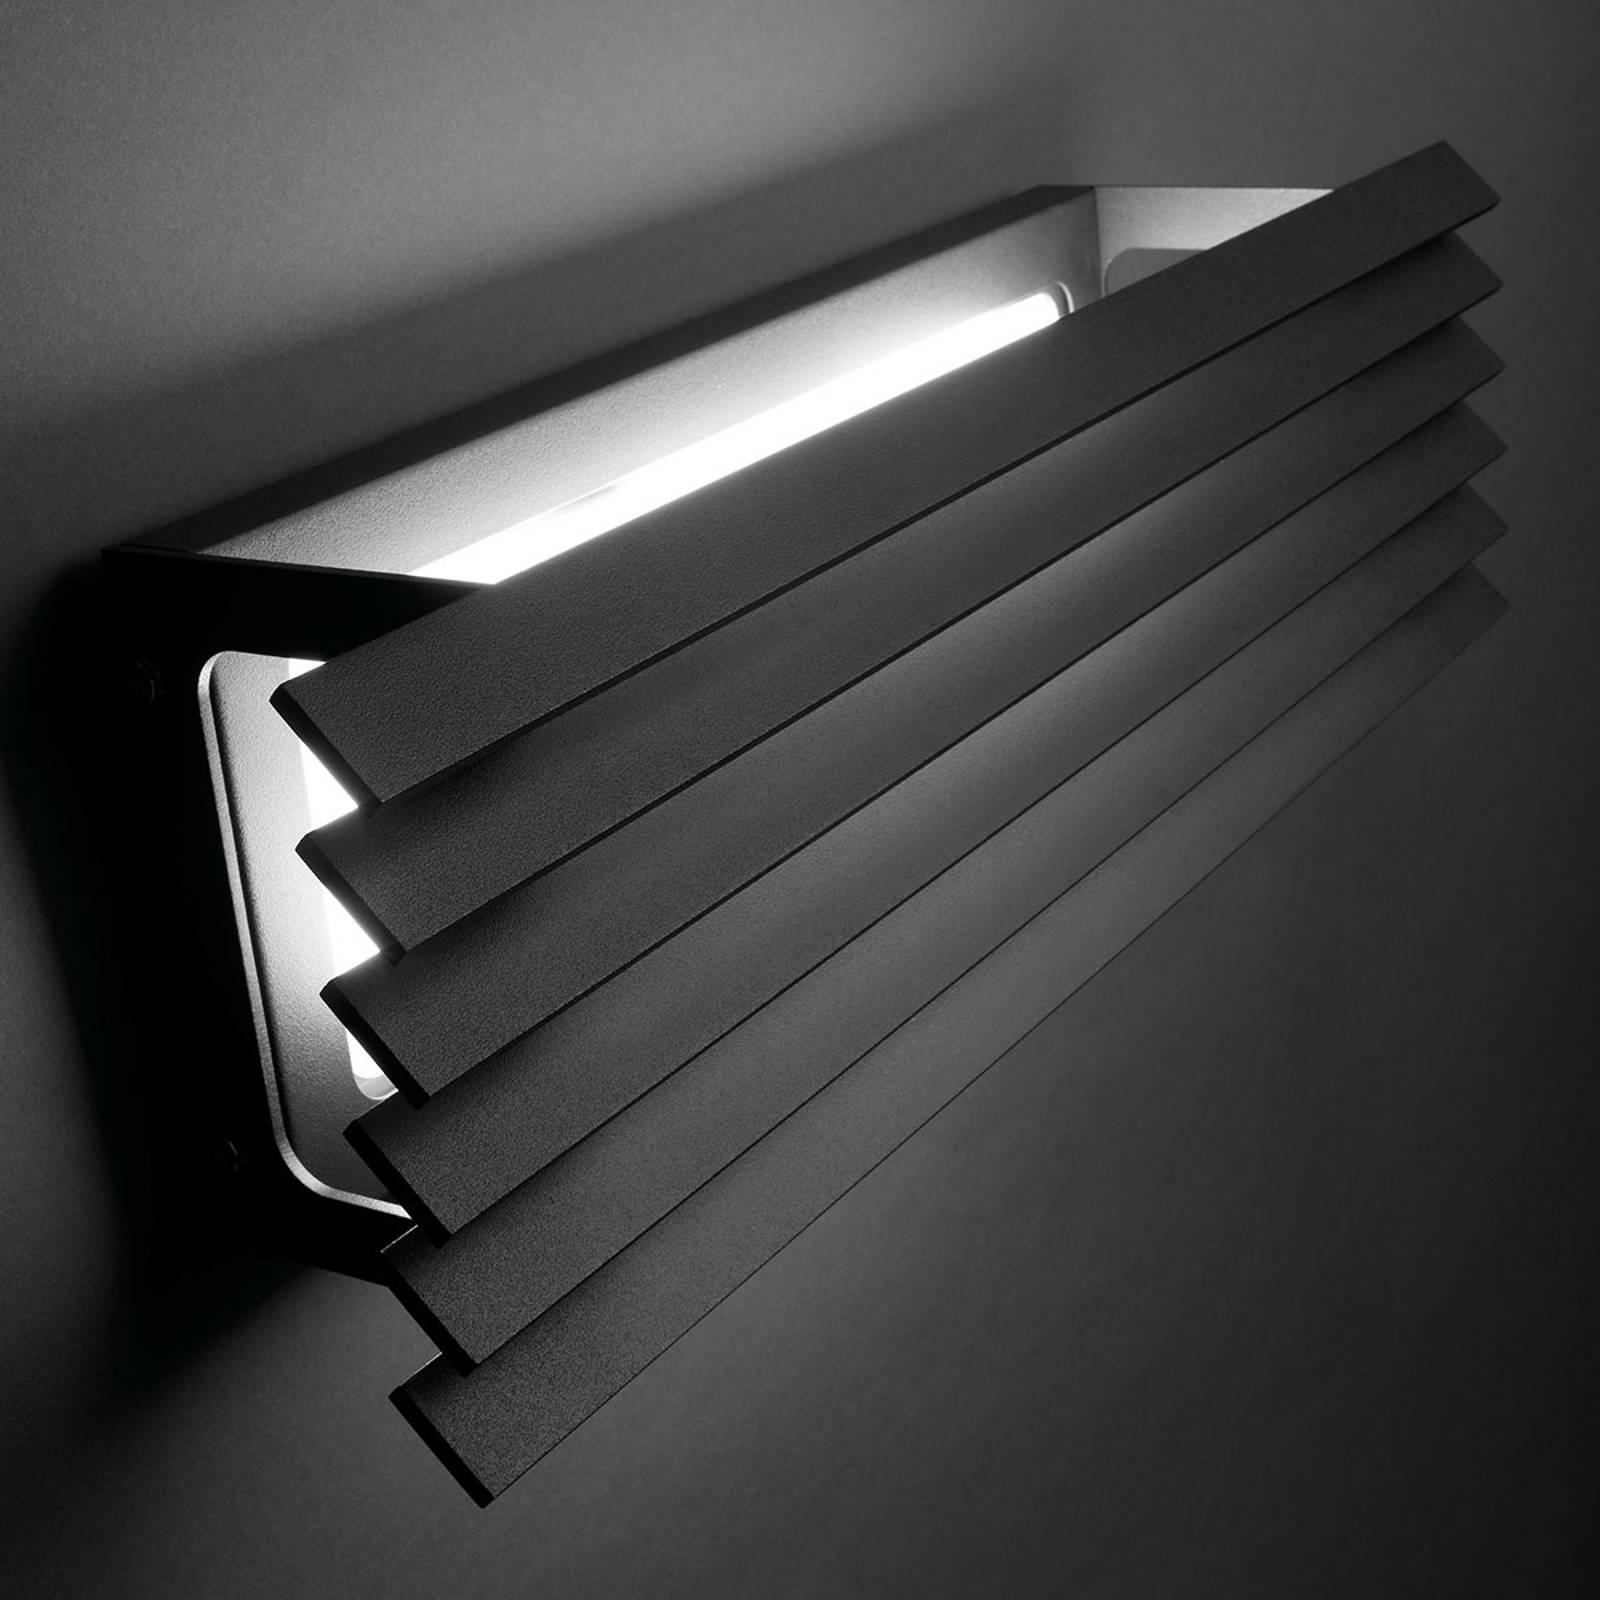 Bover Lineana H - LED buitenwandlamp met lamellen